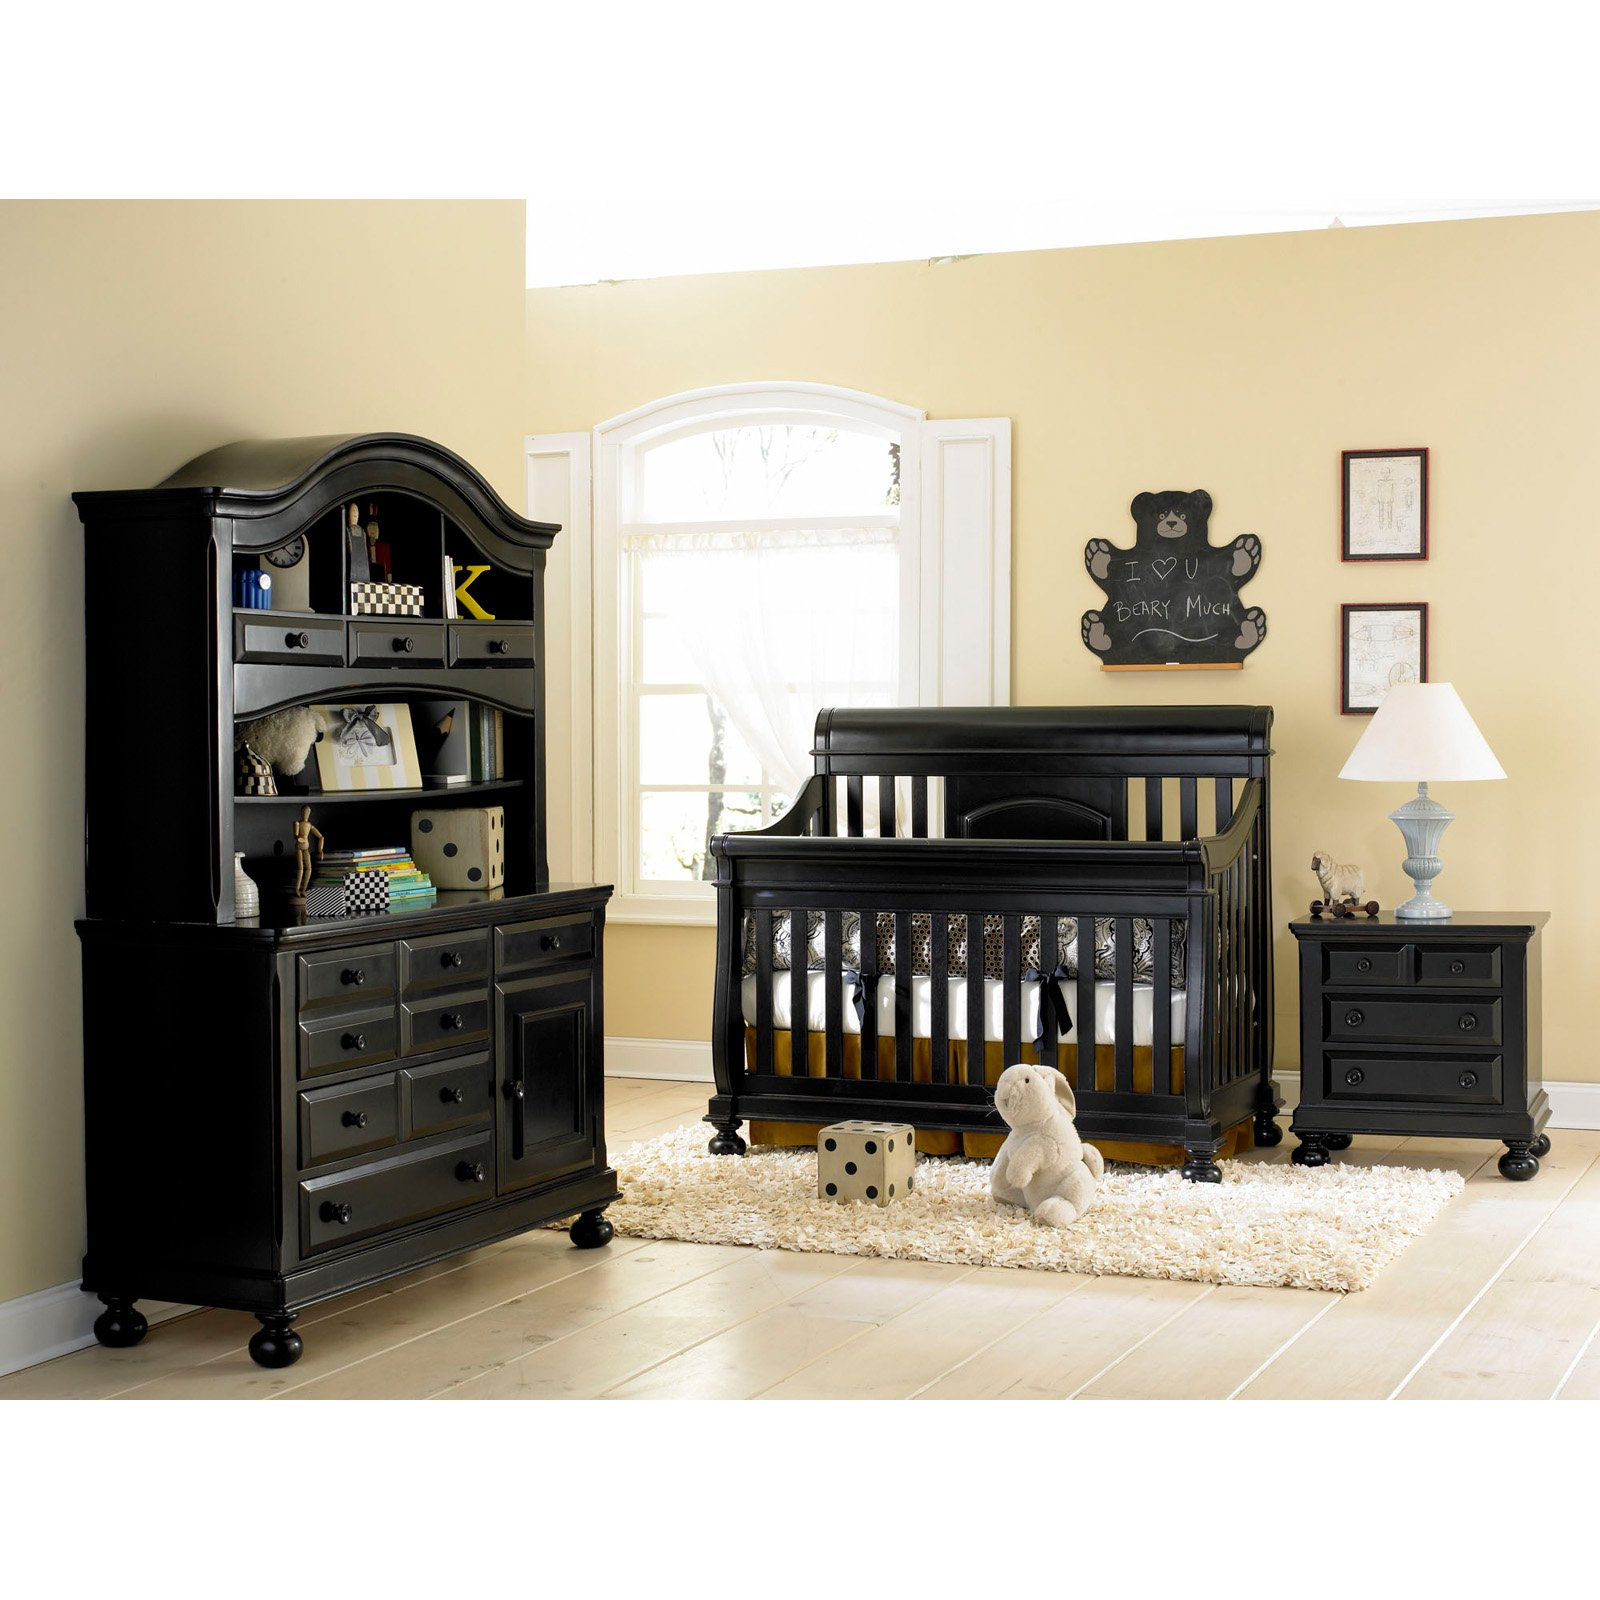 black baby bedroom furniture photo - 3